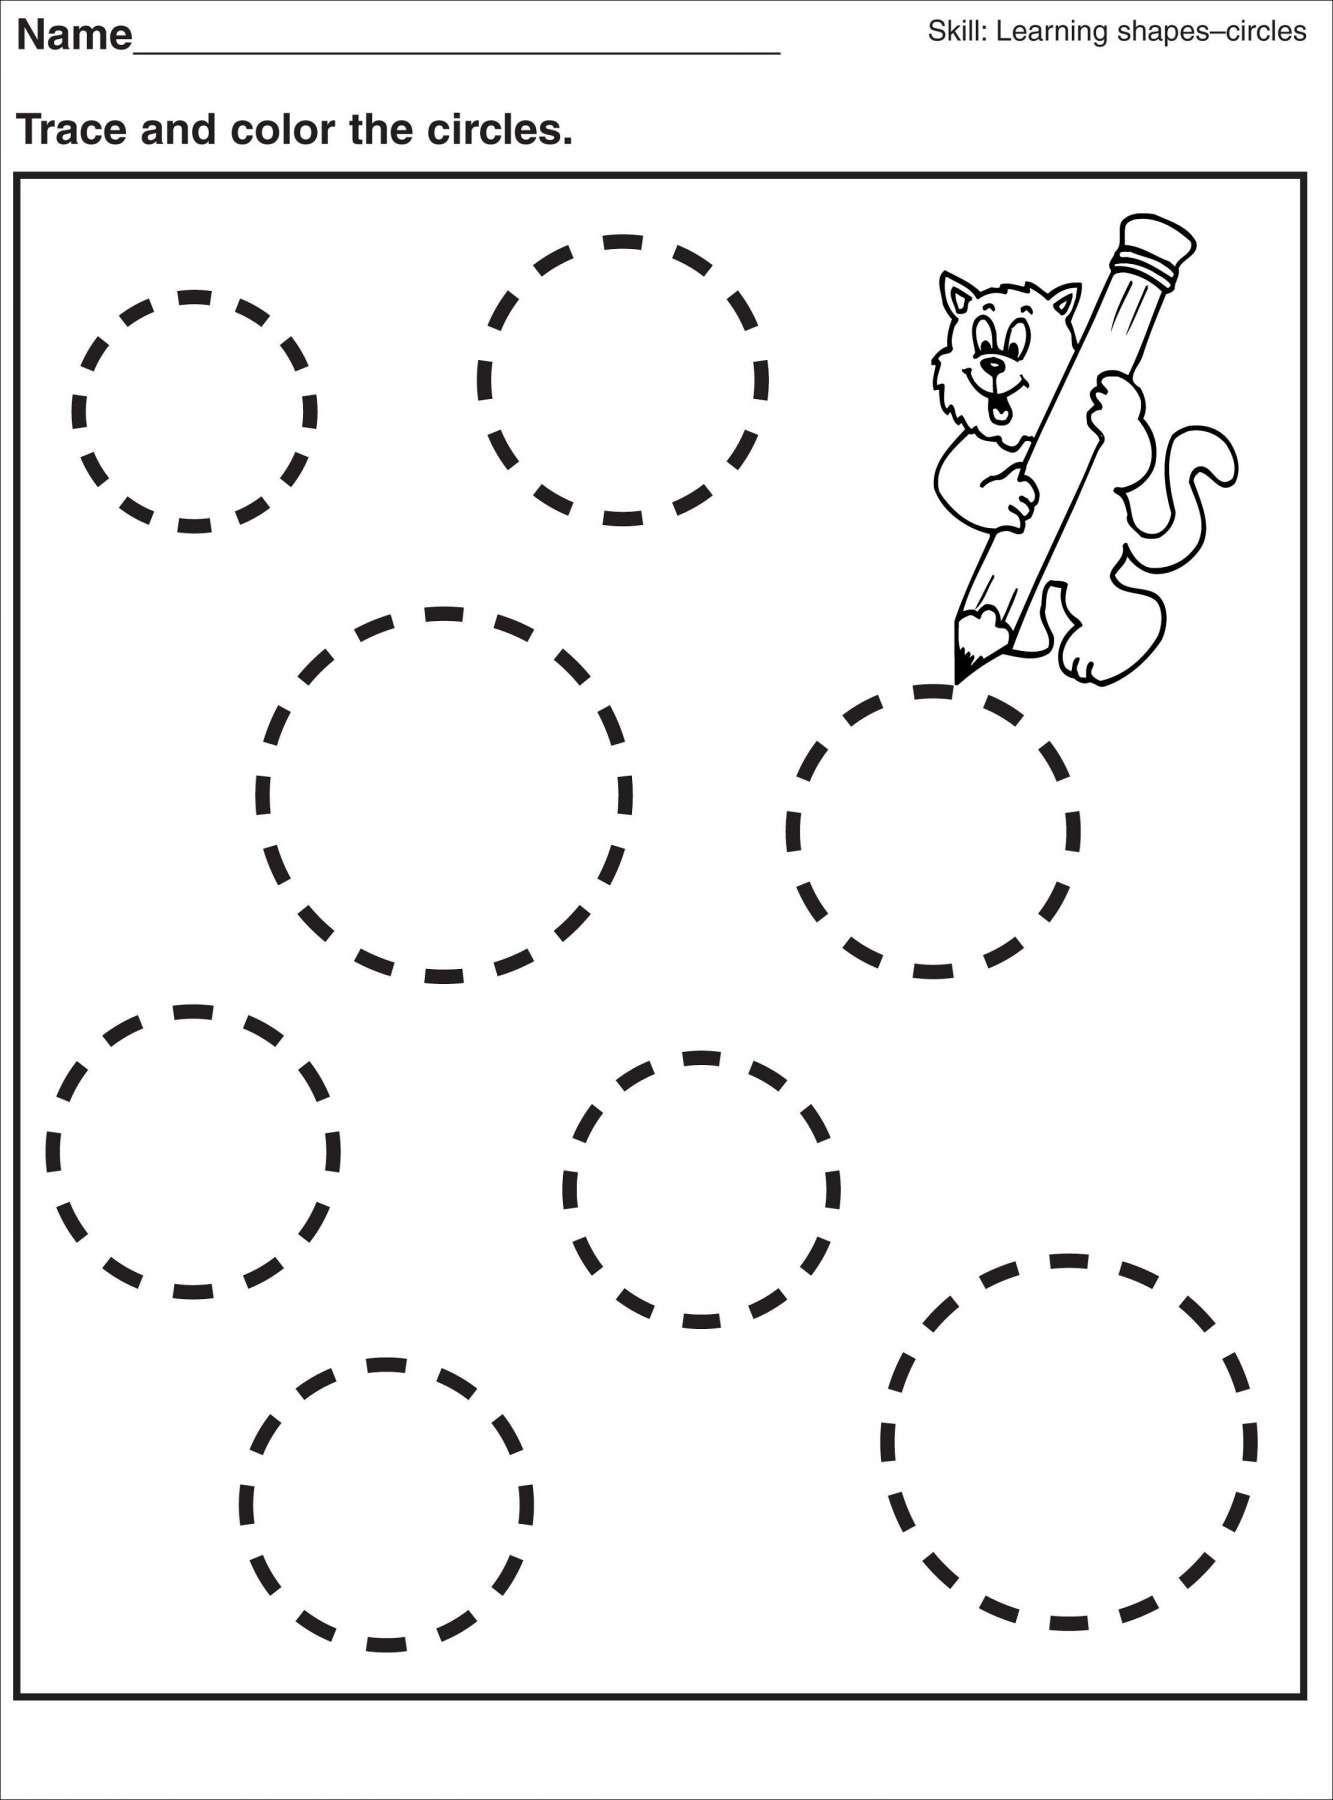 12 Preschool Worksheet Tracer Pages